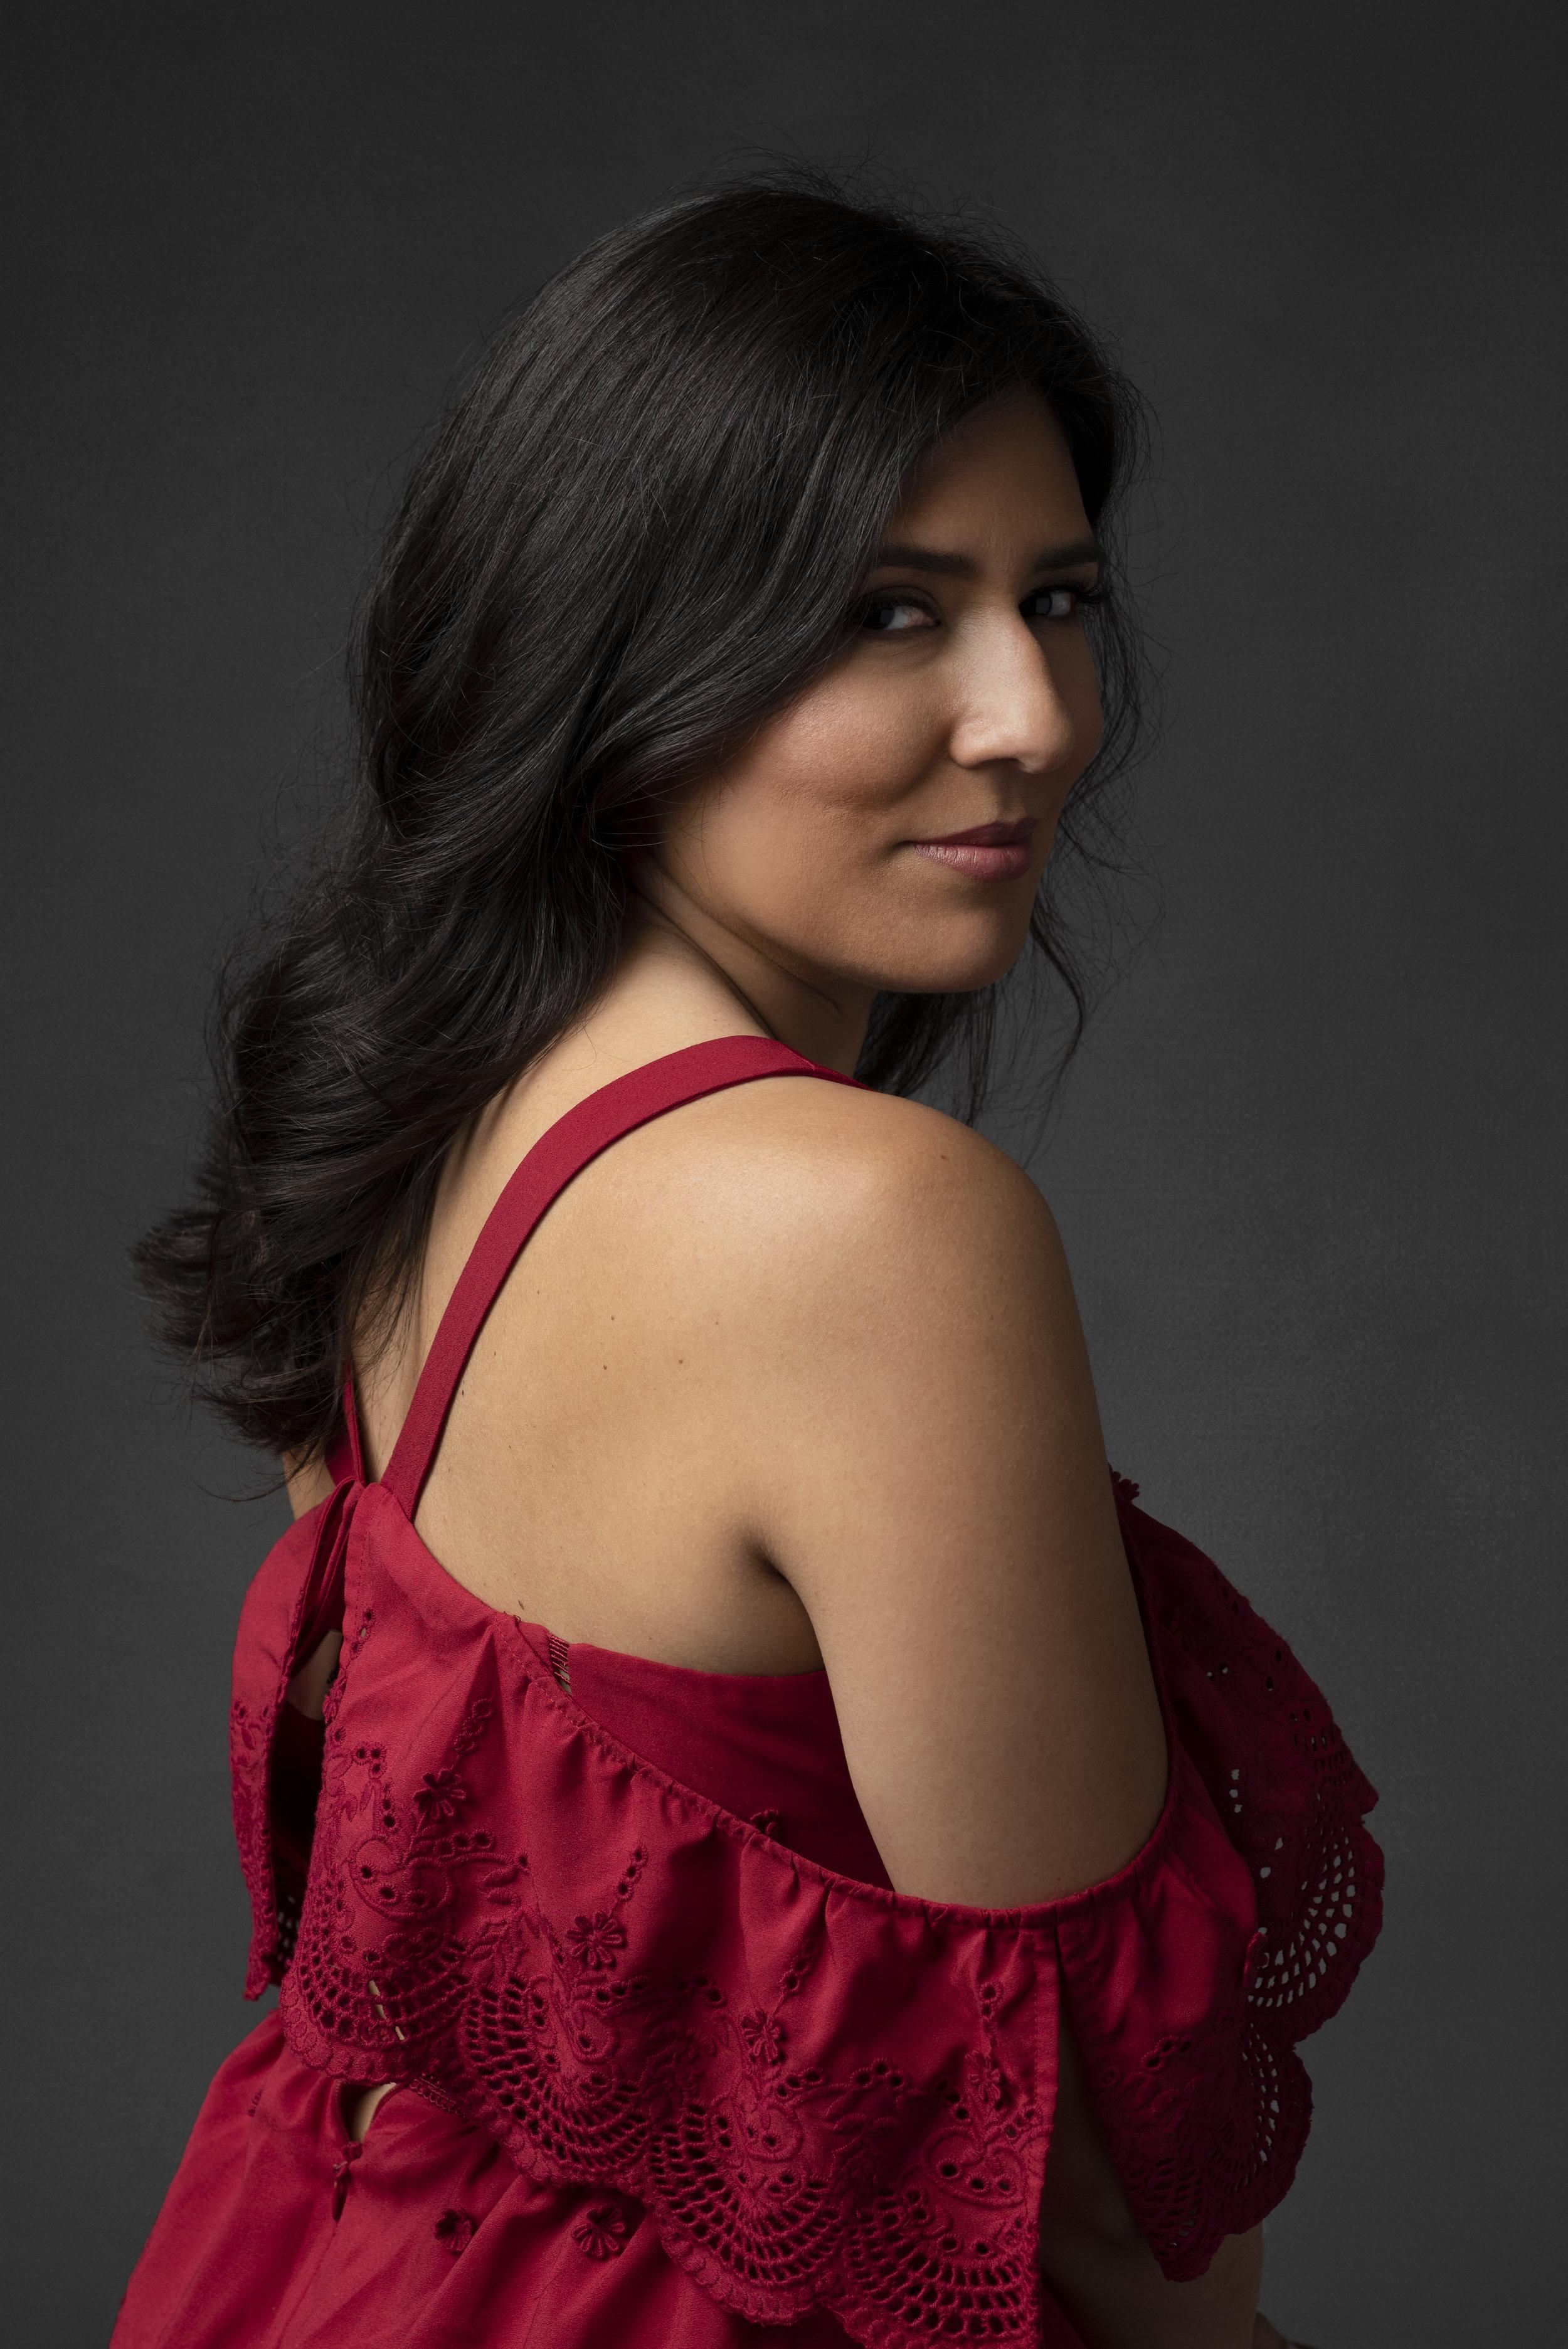 Studio portrait of woman wearing red Spanish style dress.